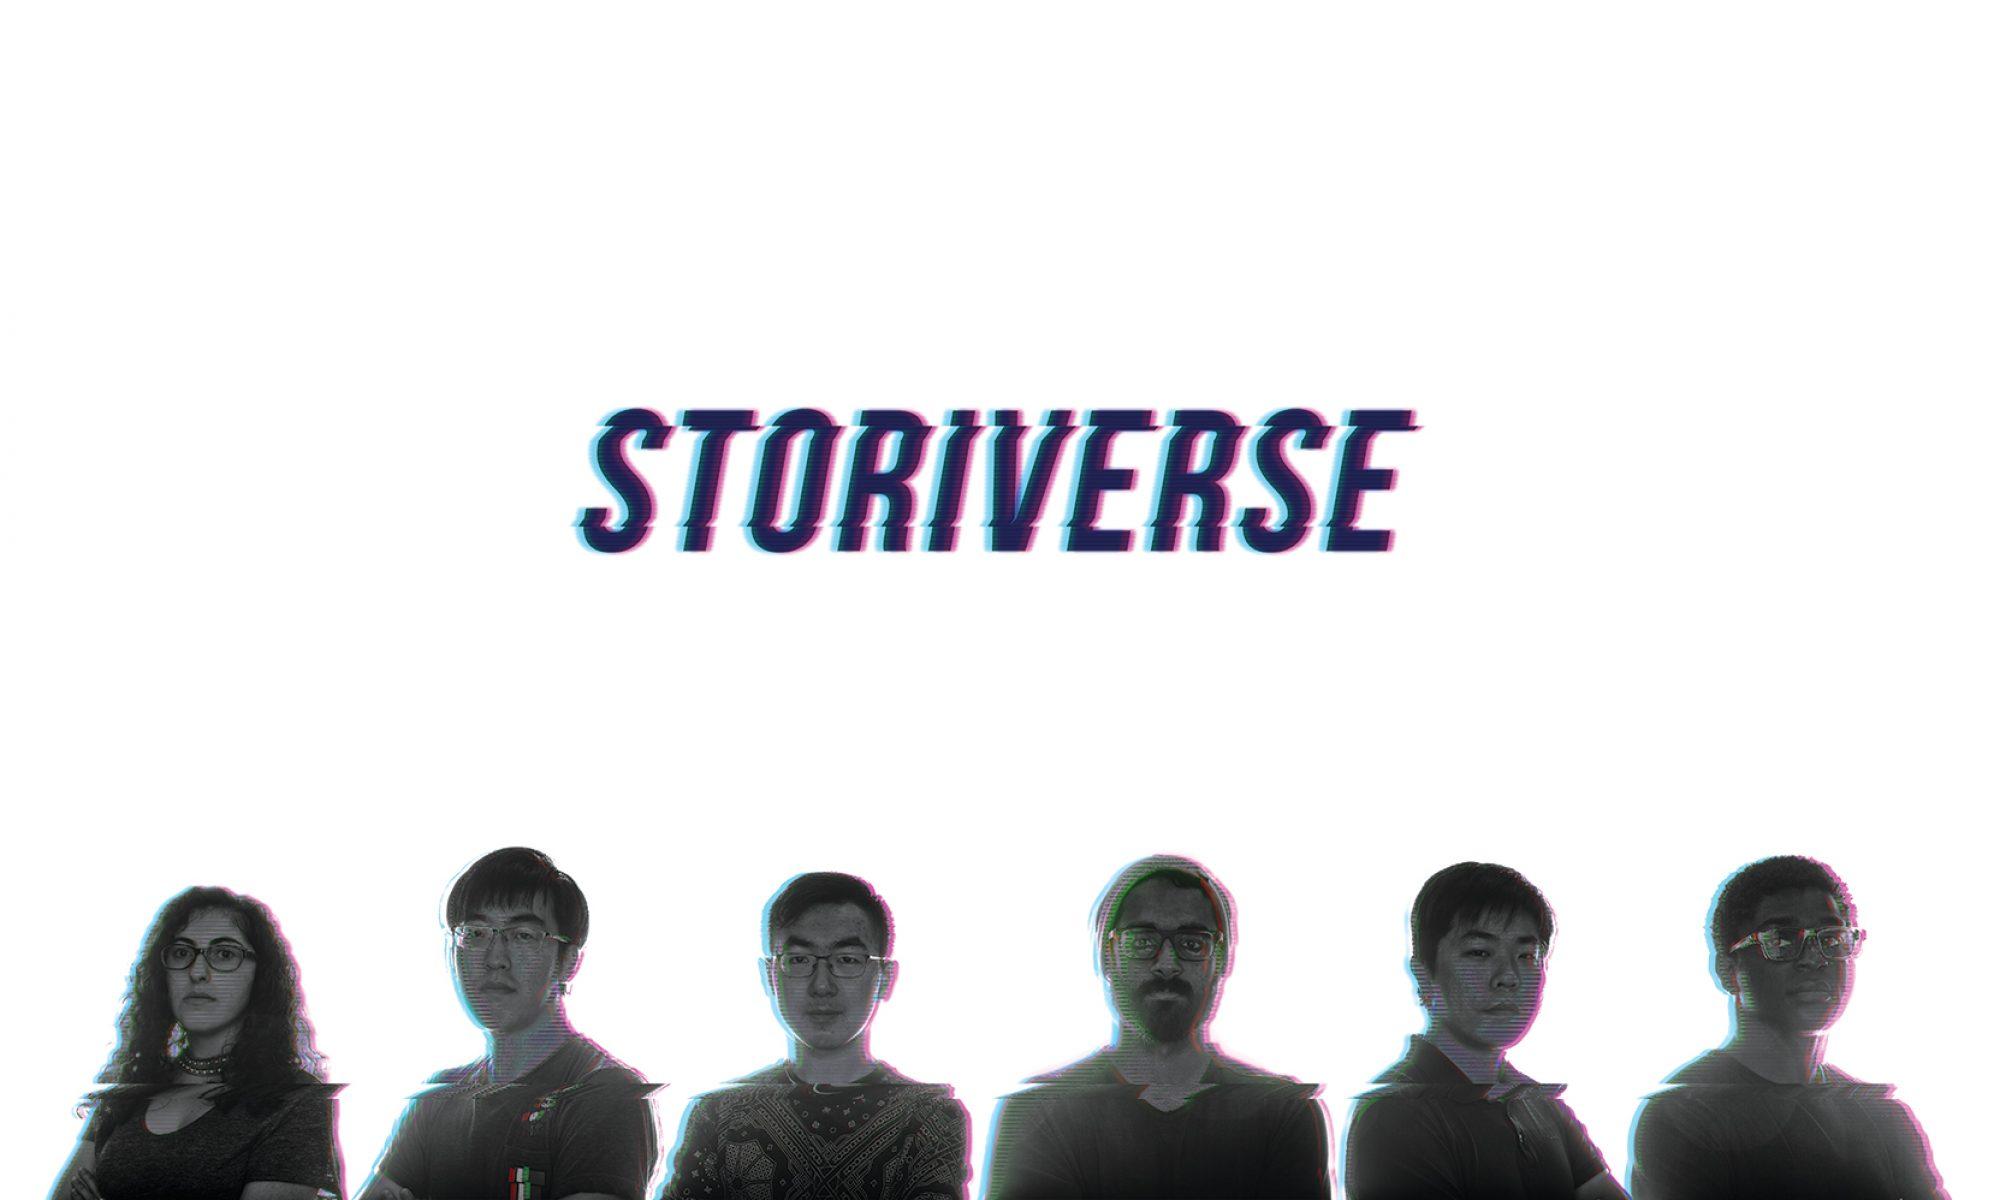 Storiverse